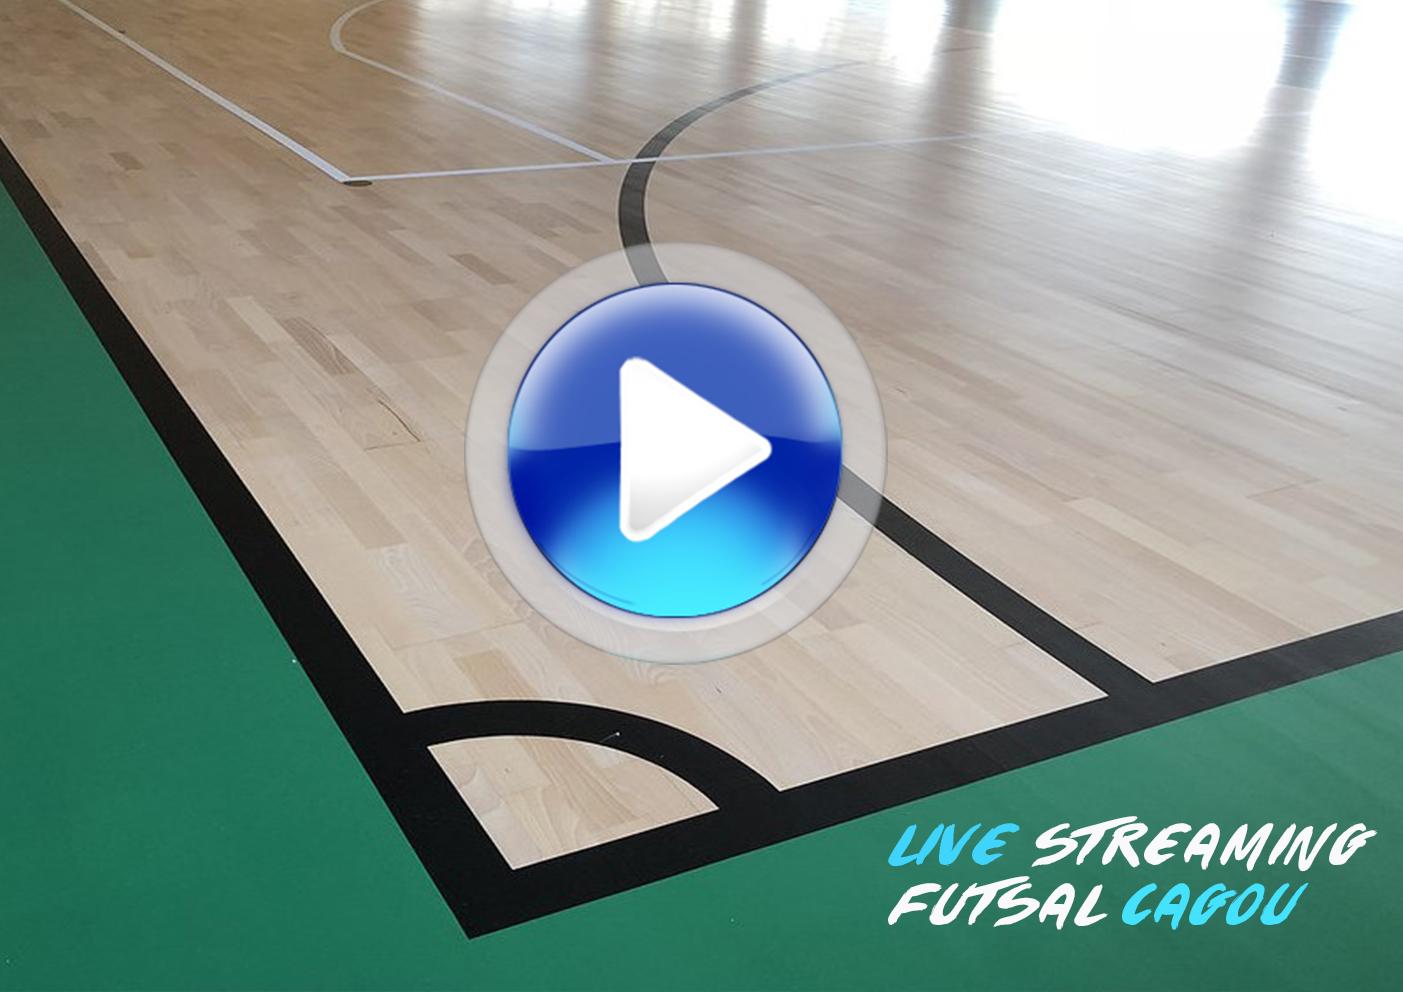 SUPER LIGUE FUTSAL Journée 11 / Chaîne Youtube FCF TV (VIDEO matchs)